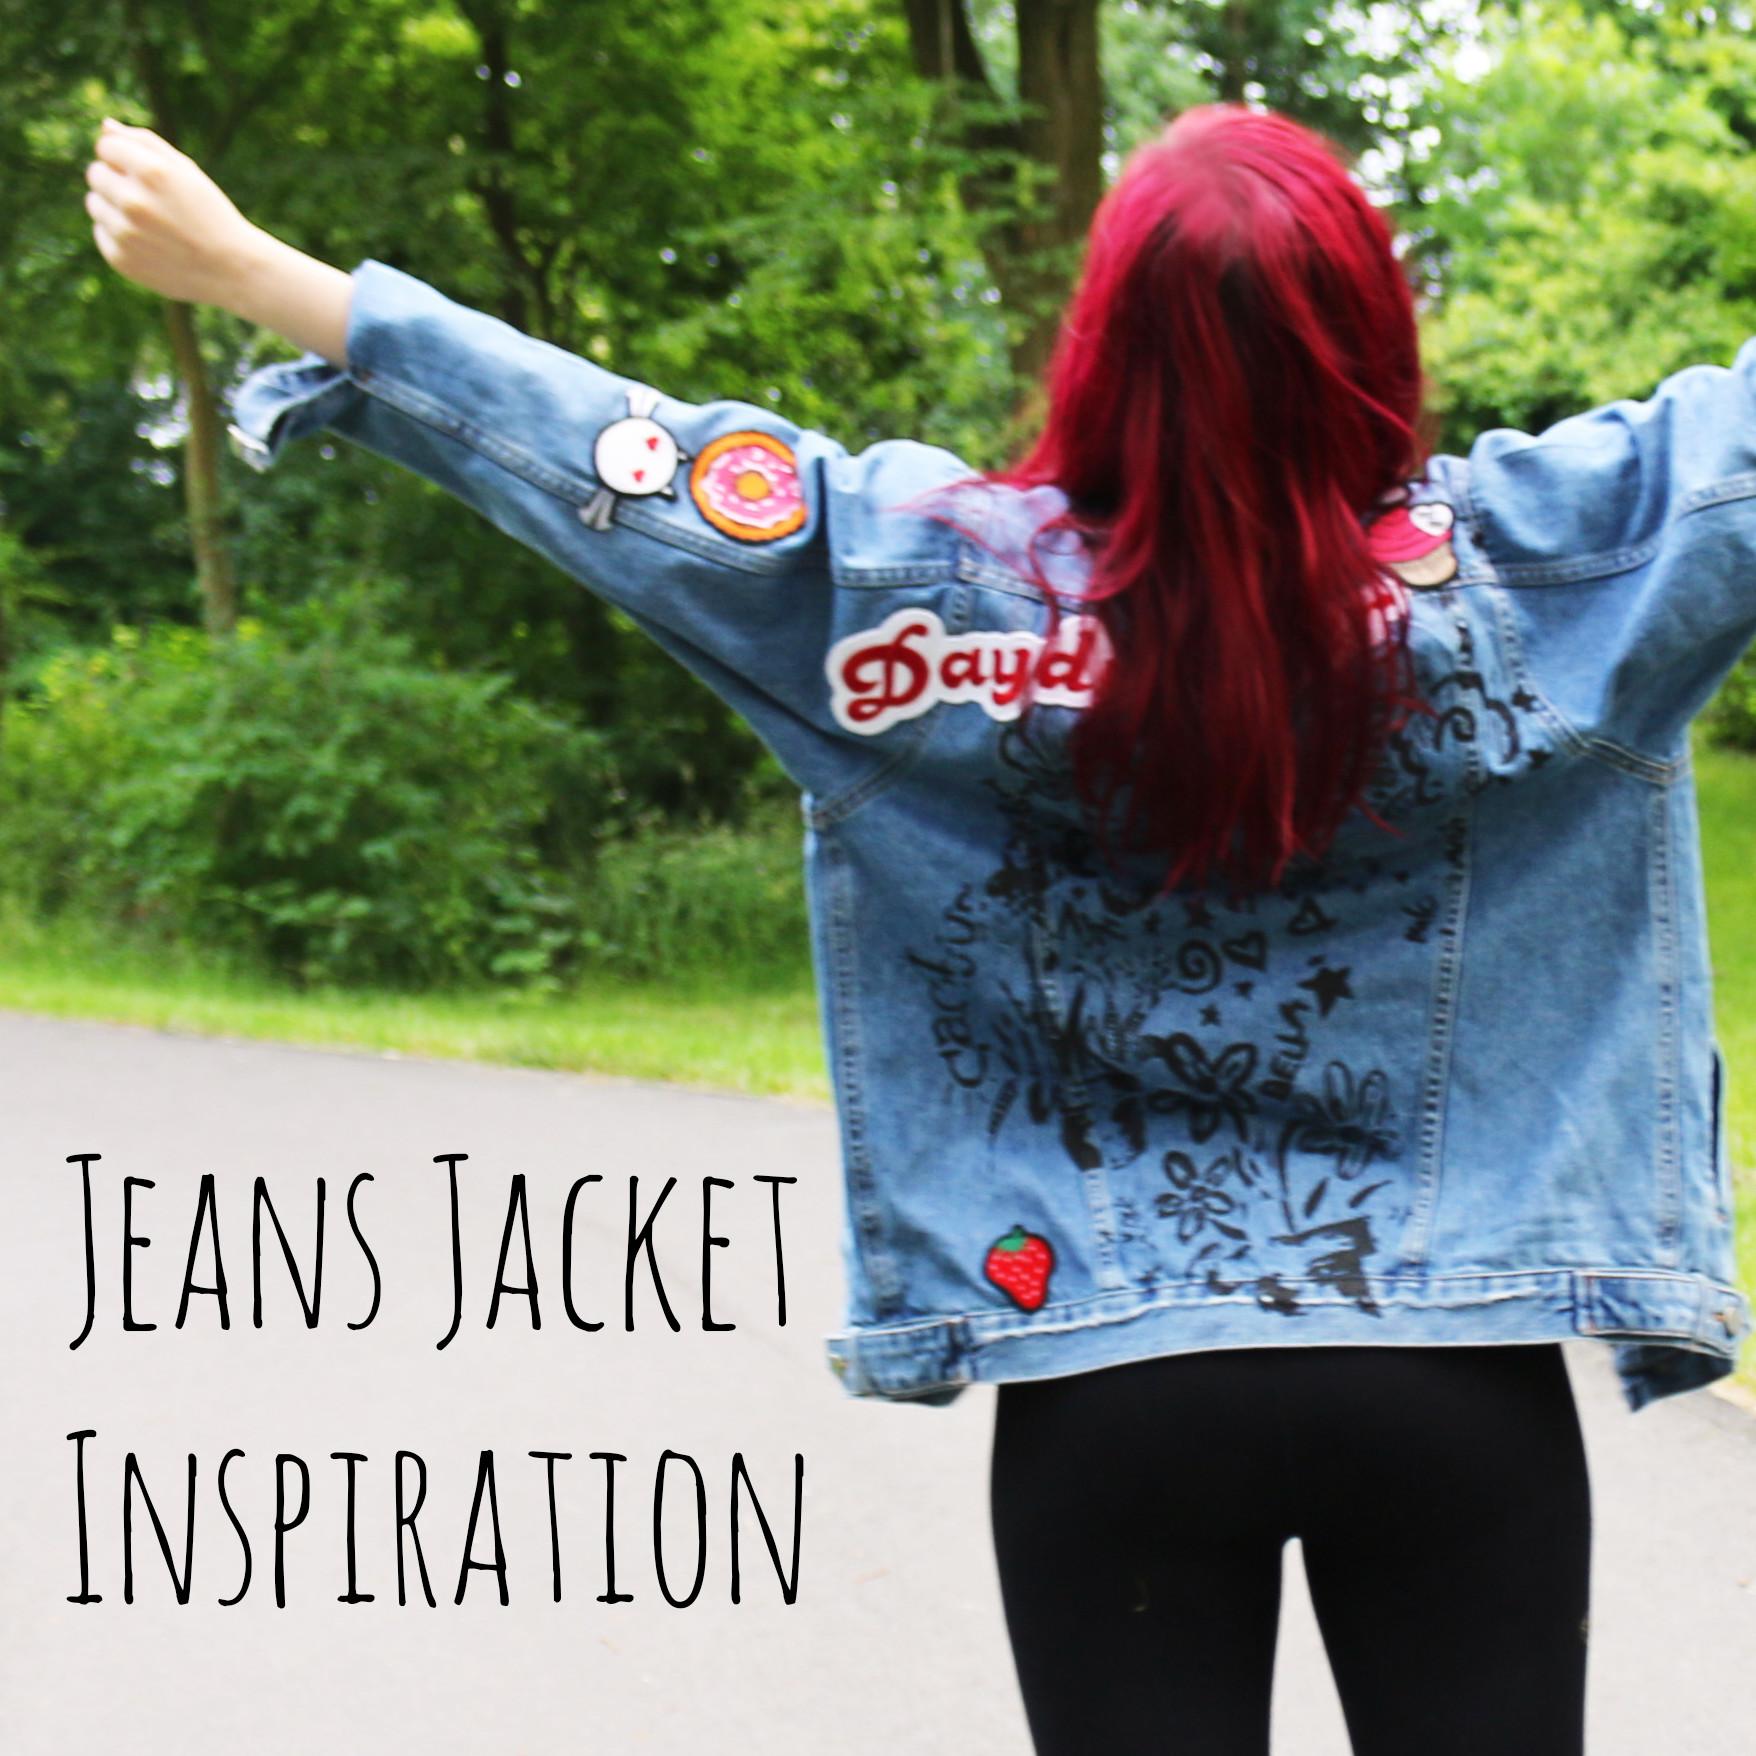 Jeans Jacket Inspiration